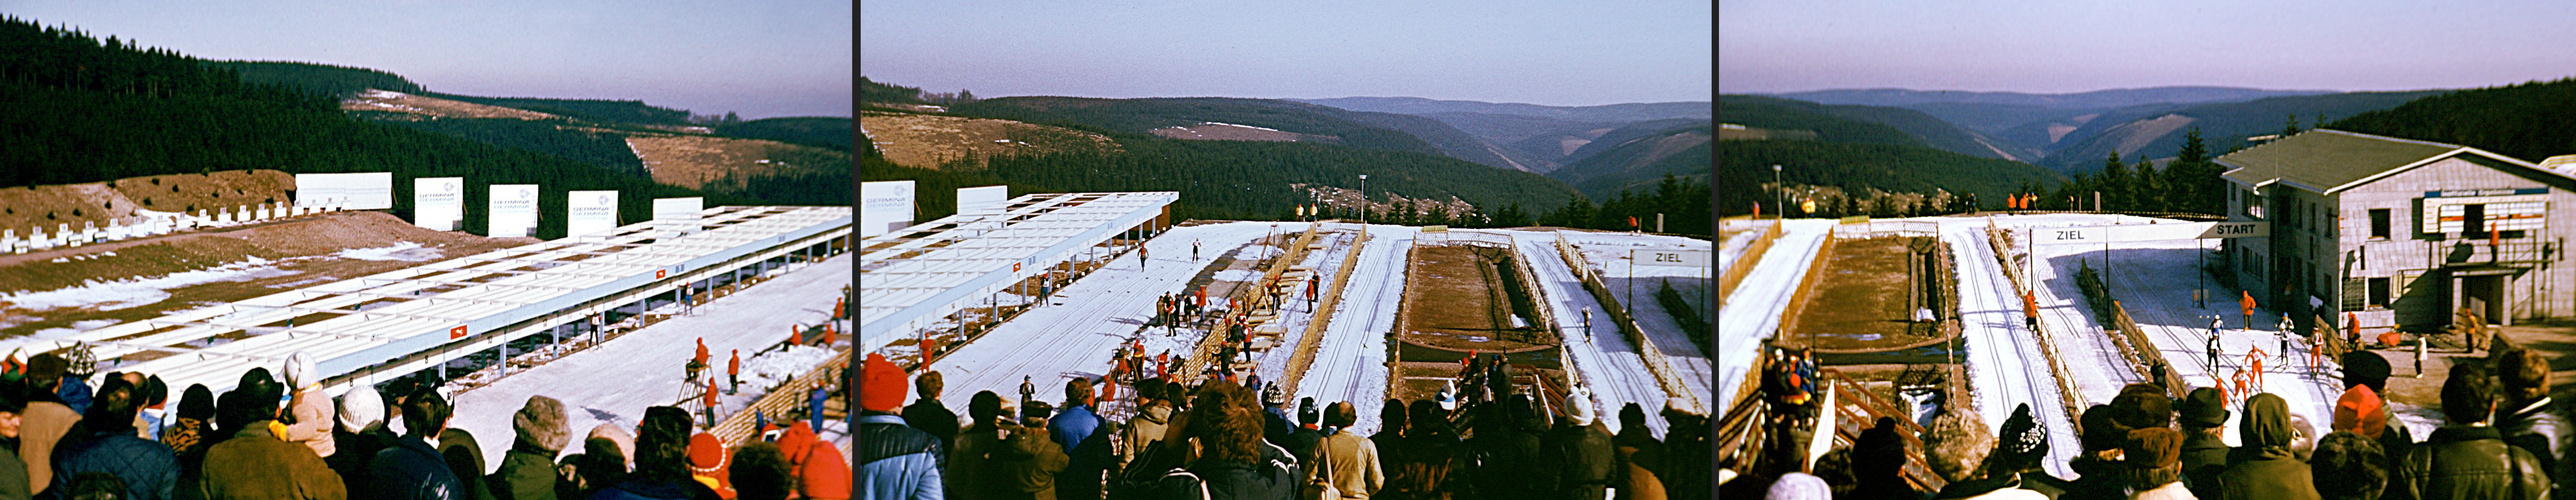 Oberhof 1983: Biathlon-Staffel